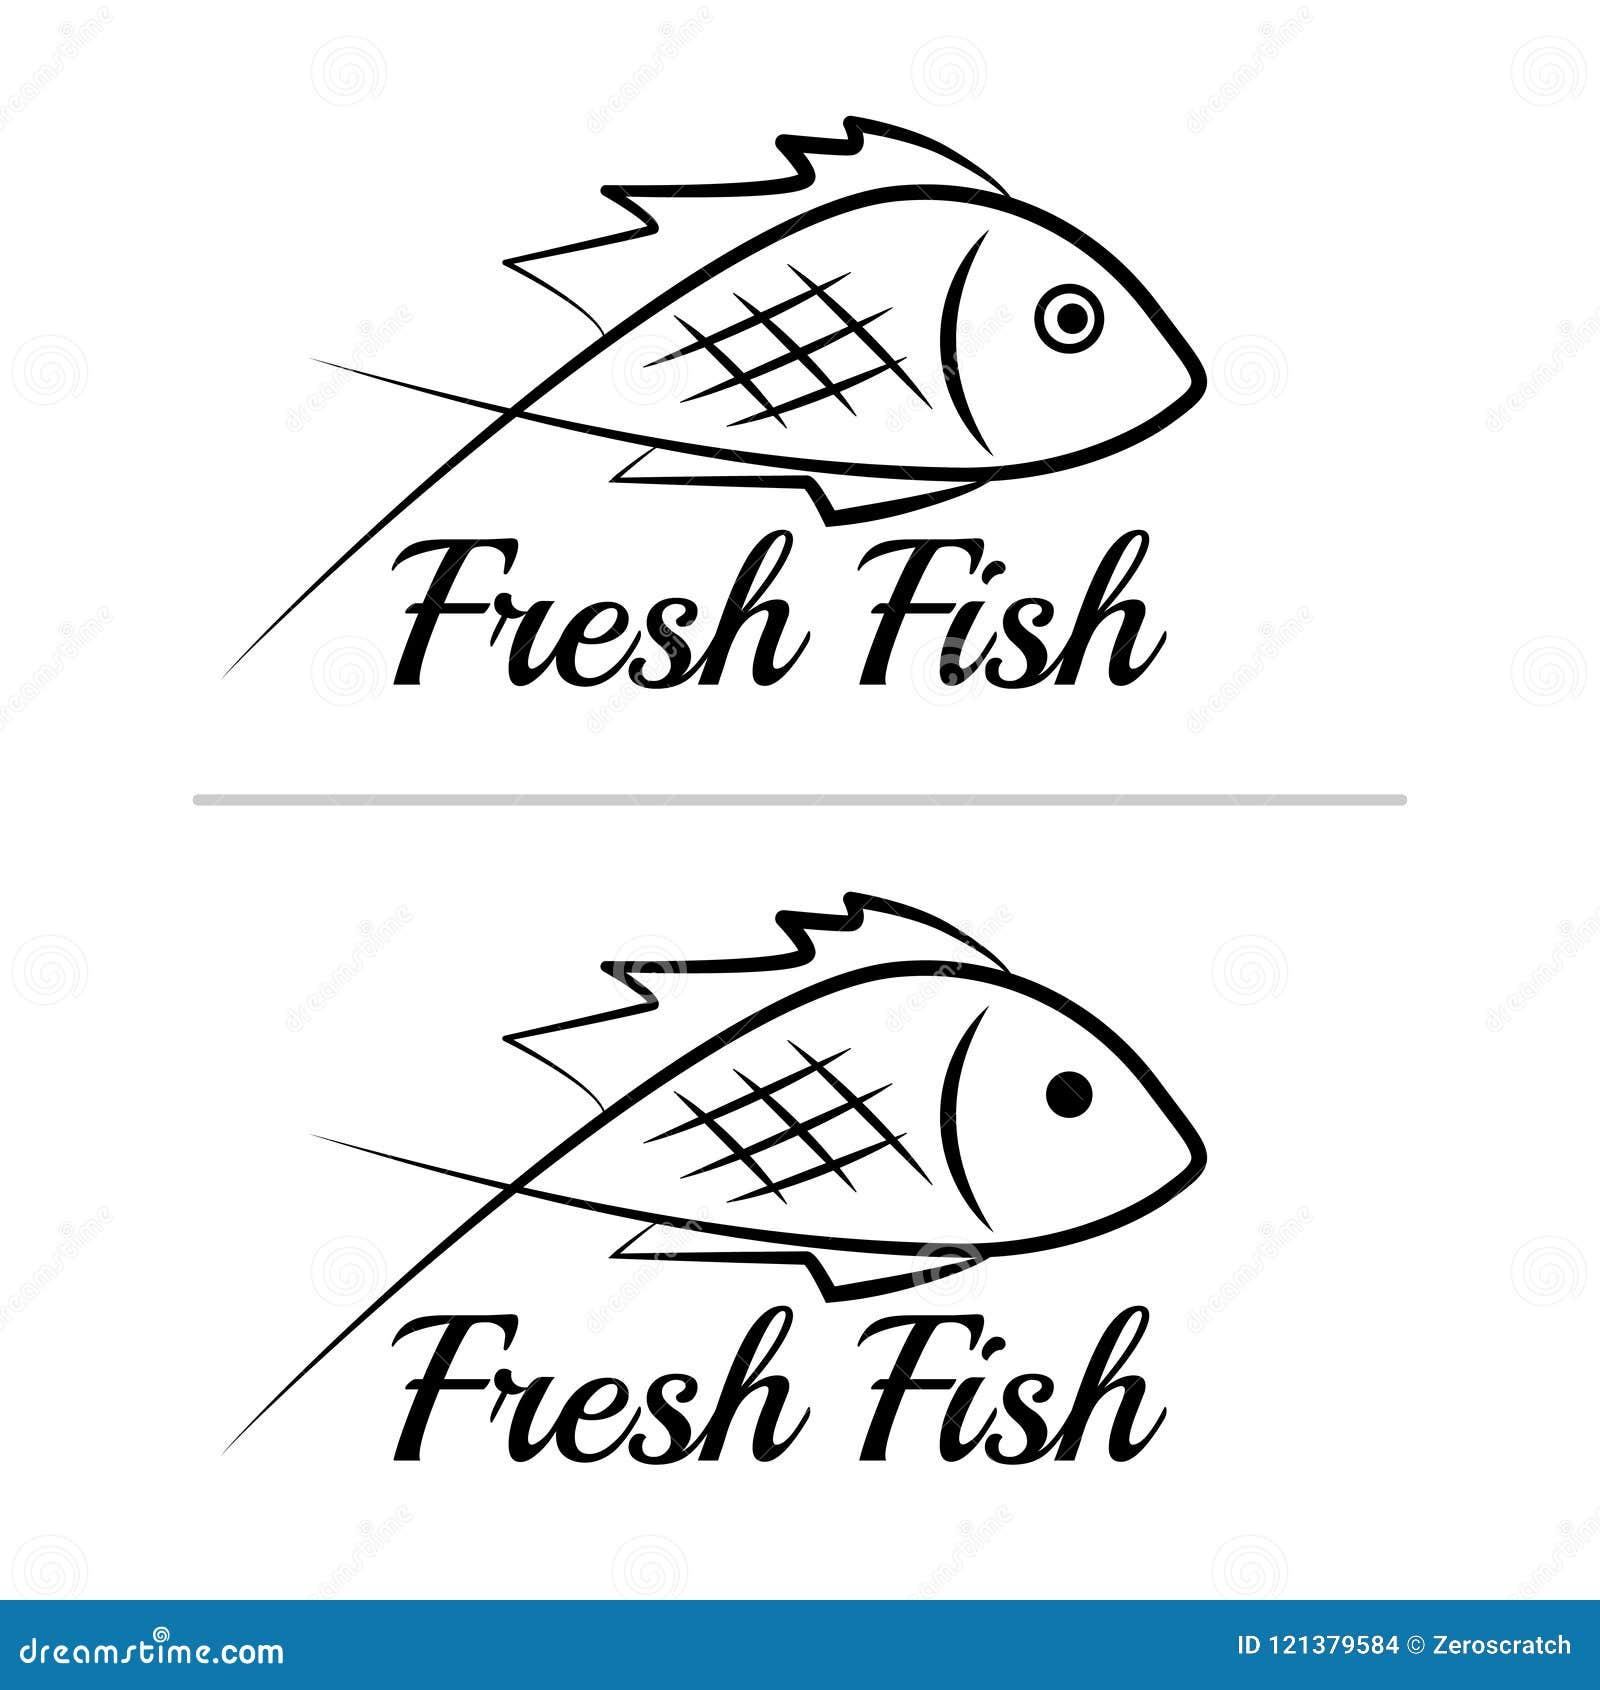 Fresh fish logo symbol icon sign simple black colored set